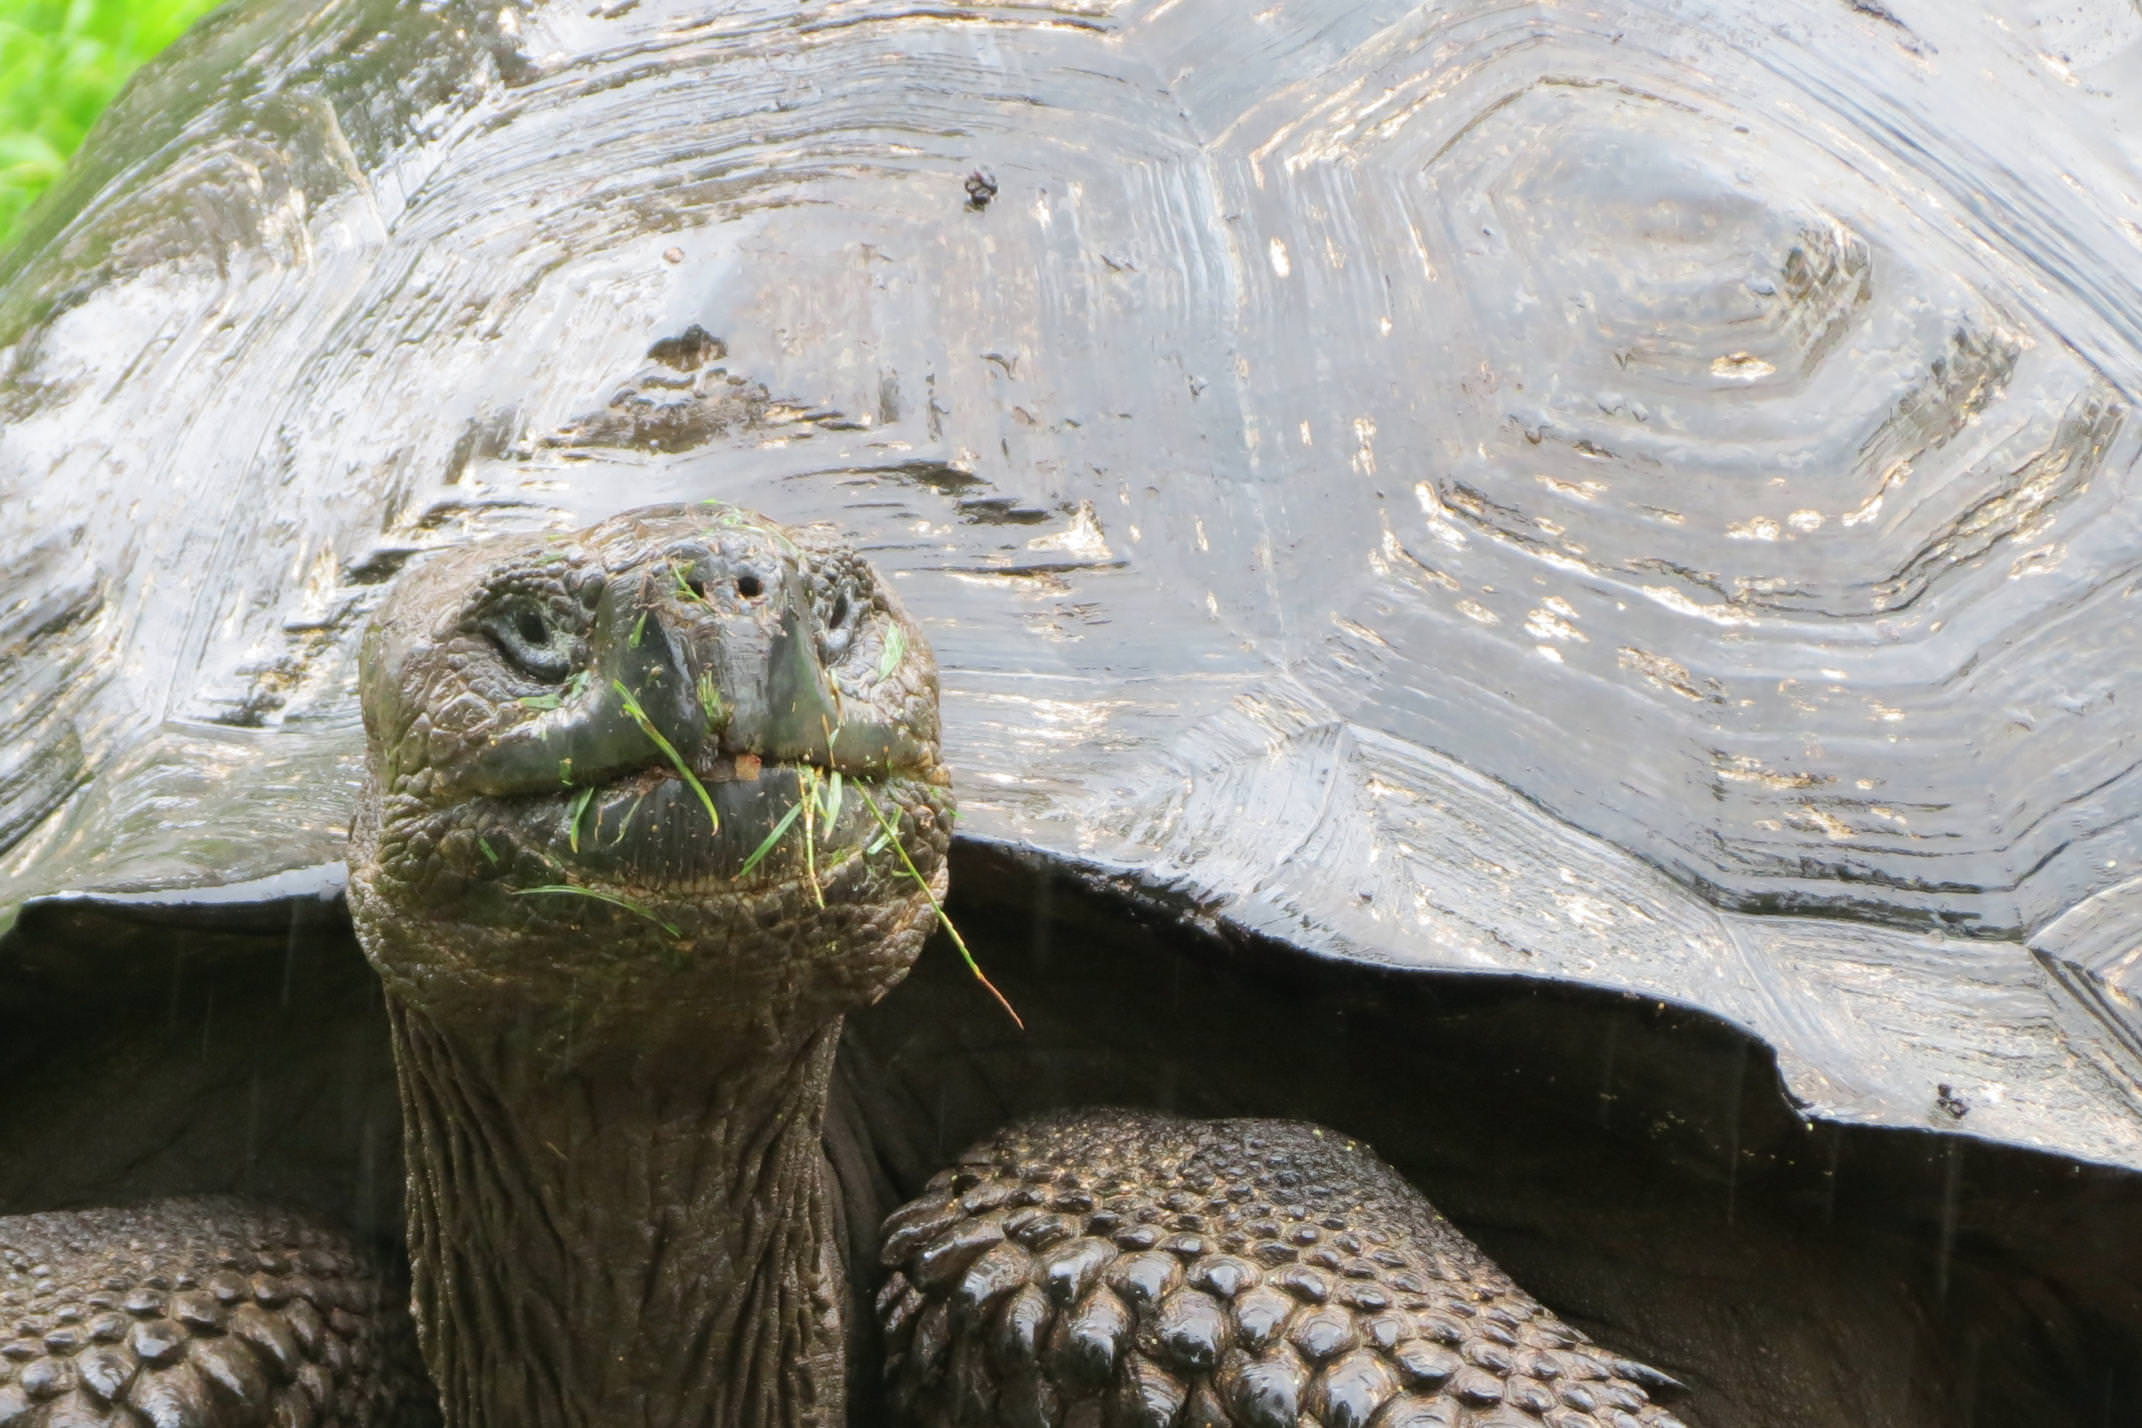 Ecuador galapagos islands santa cruz giant tortoise grassy nose